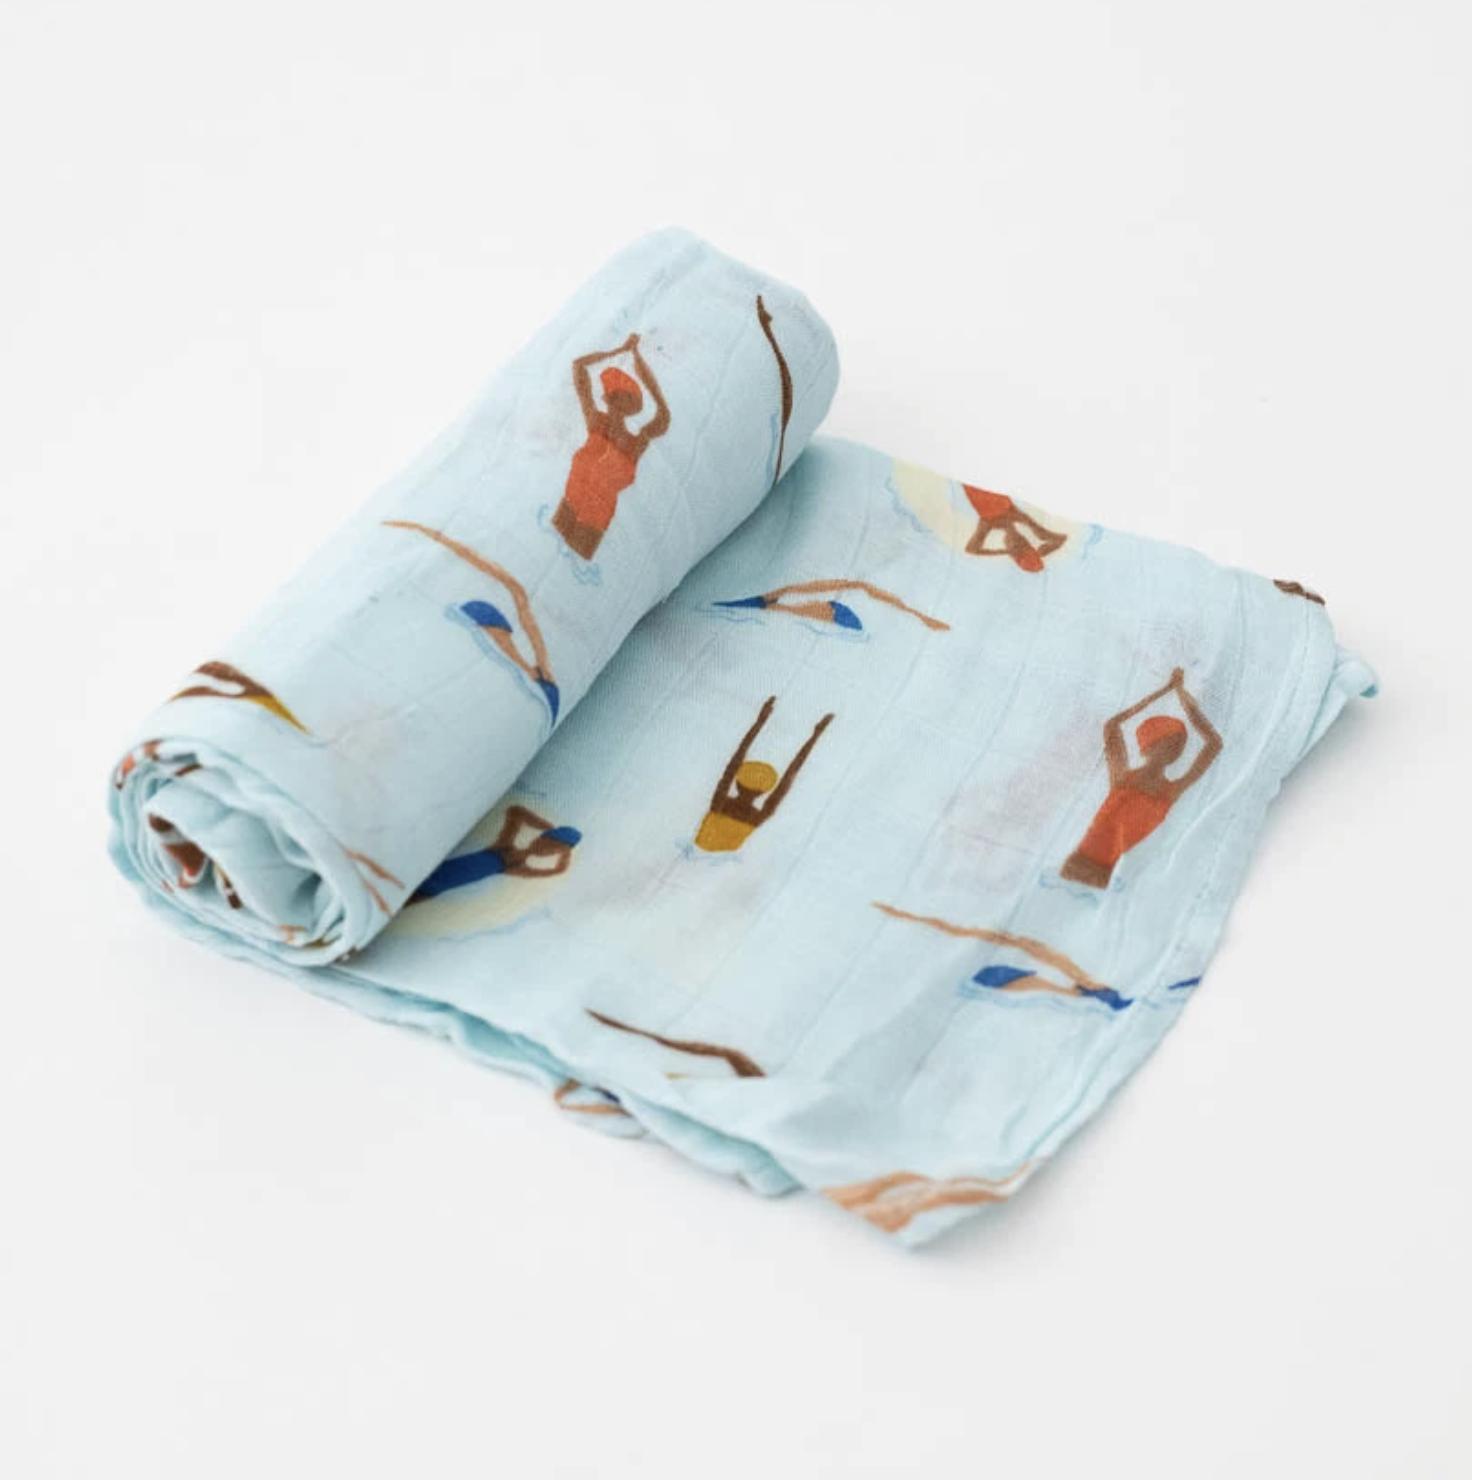 Little Unicorn Deluxe Swaddle Blanket - Swim Cap